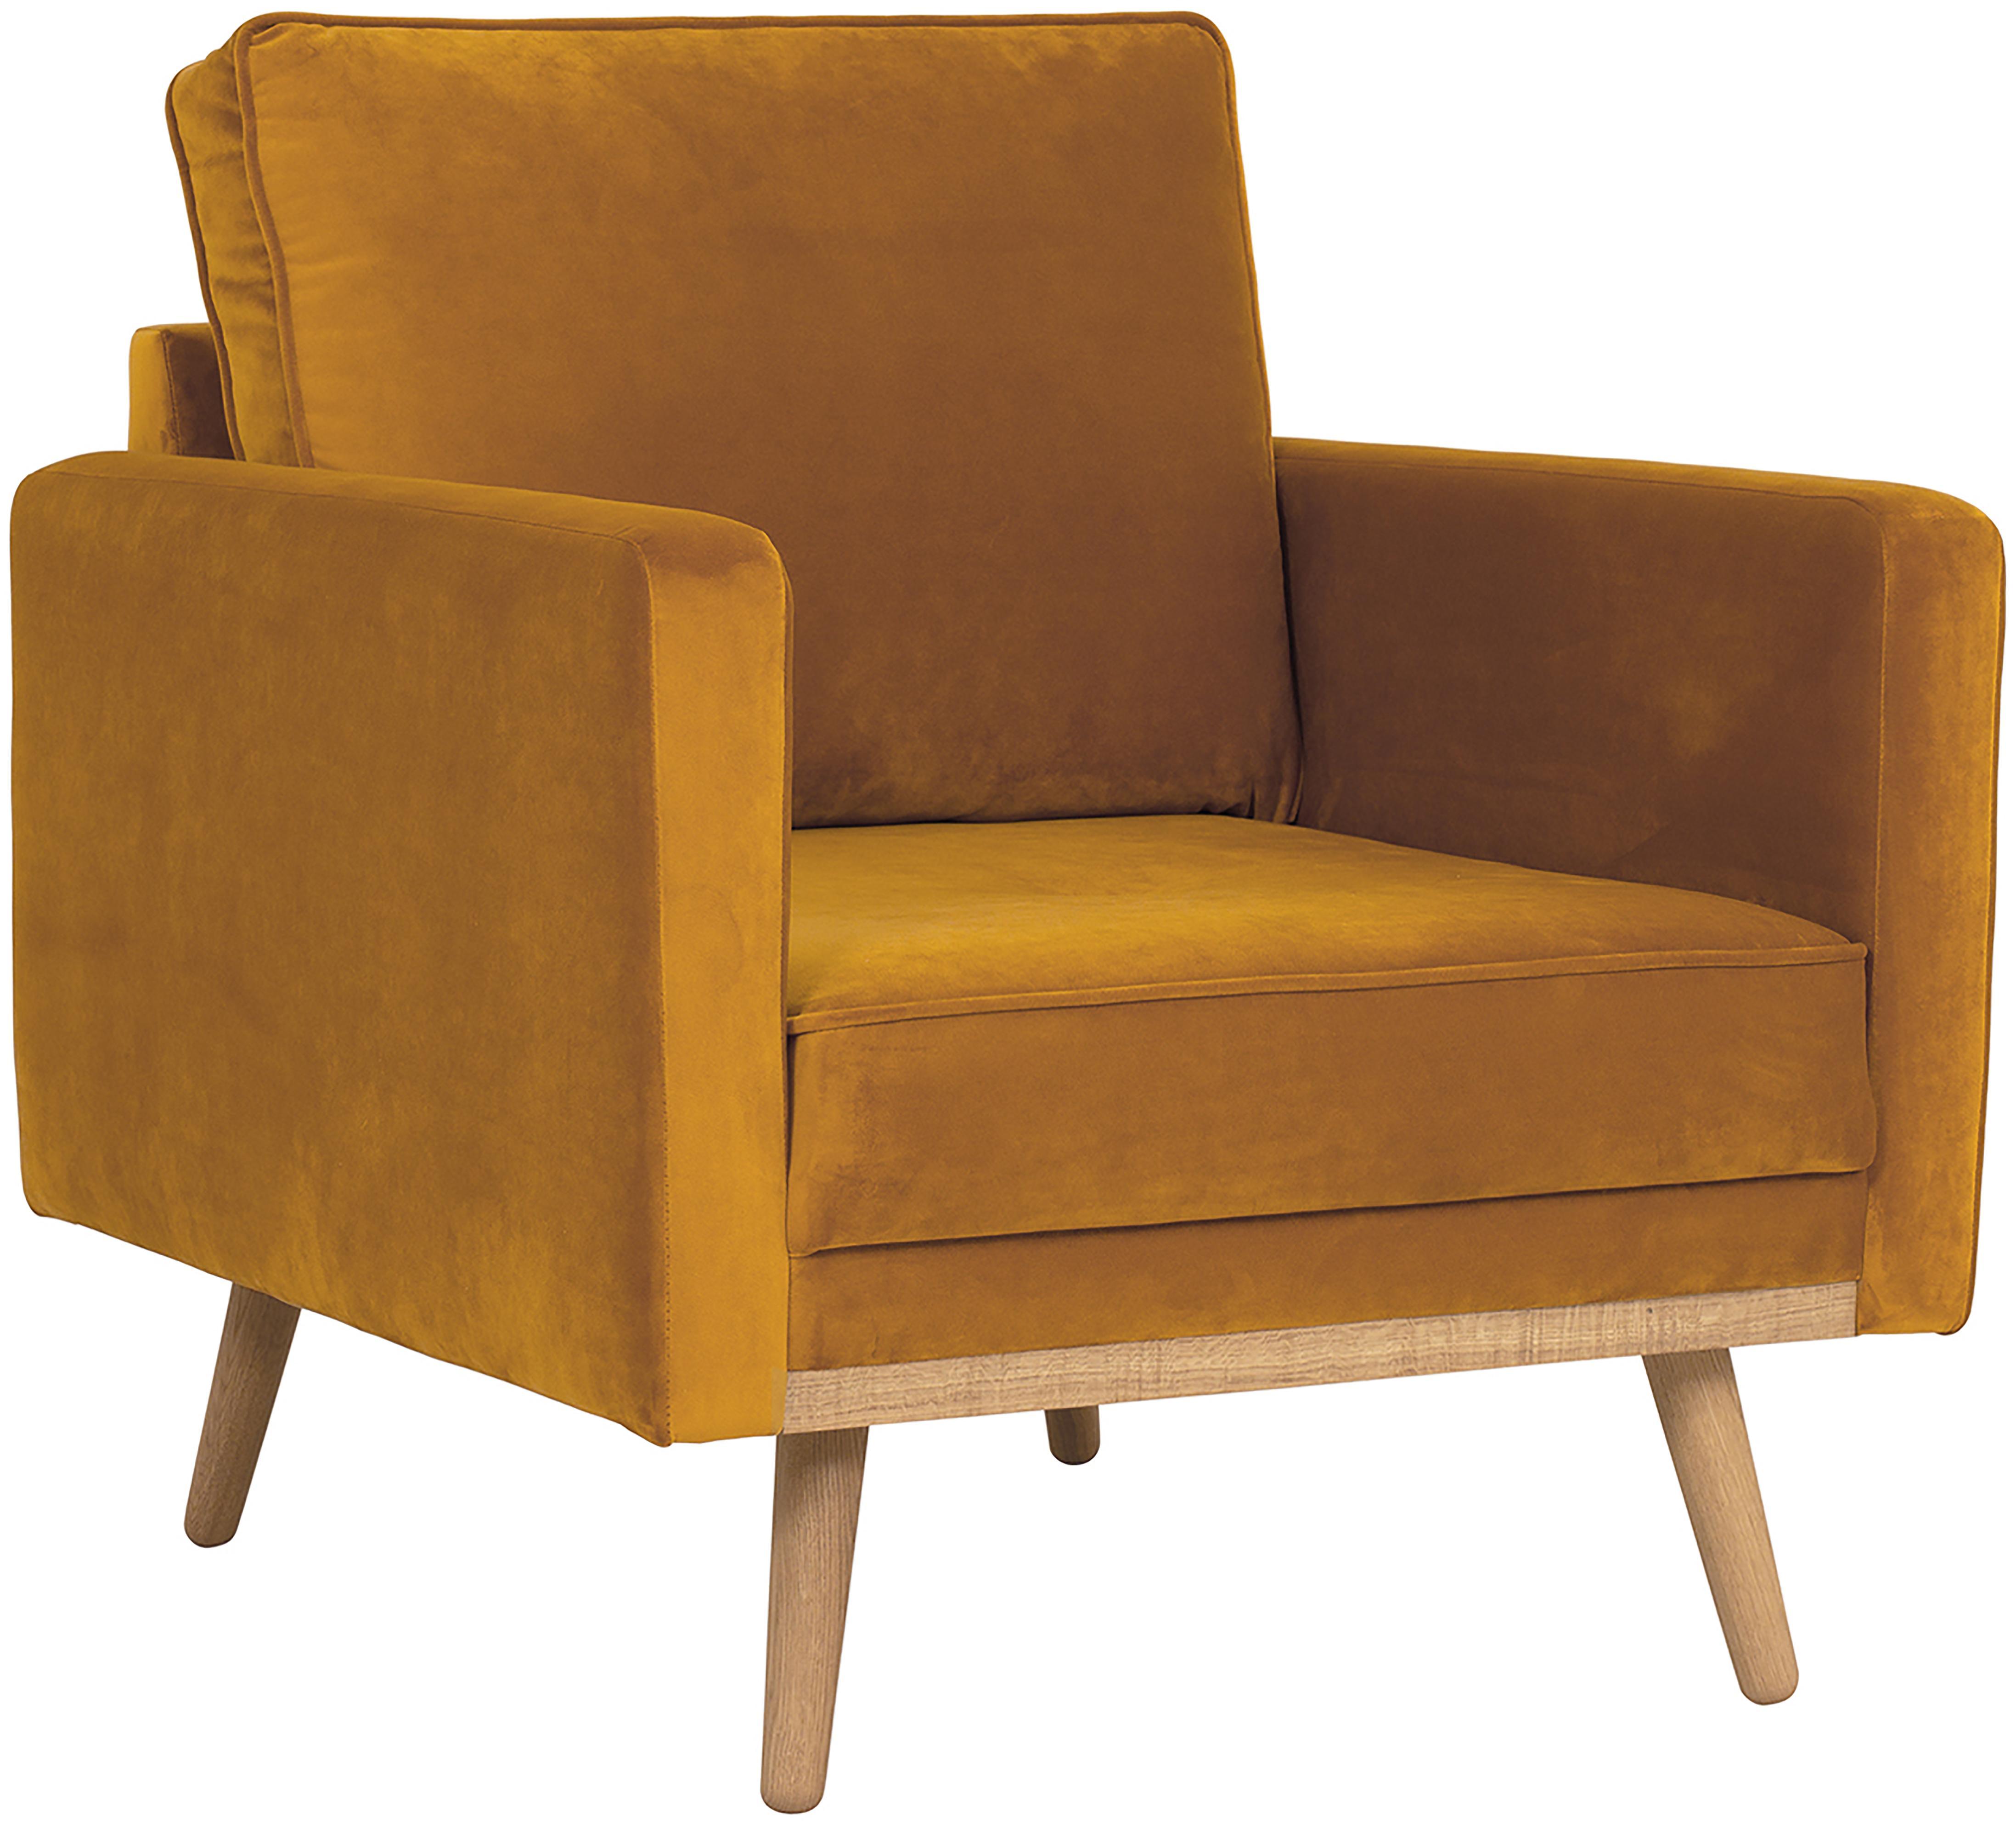 Samt-Sessel Saint, Bezug: Samt (Polyester) Der hoch, Gestell: Massives Eichenholz, Span, Samt Senfgelb, B 85 x T 76 cm